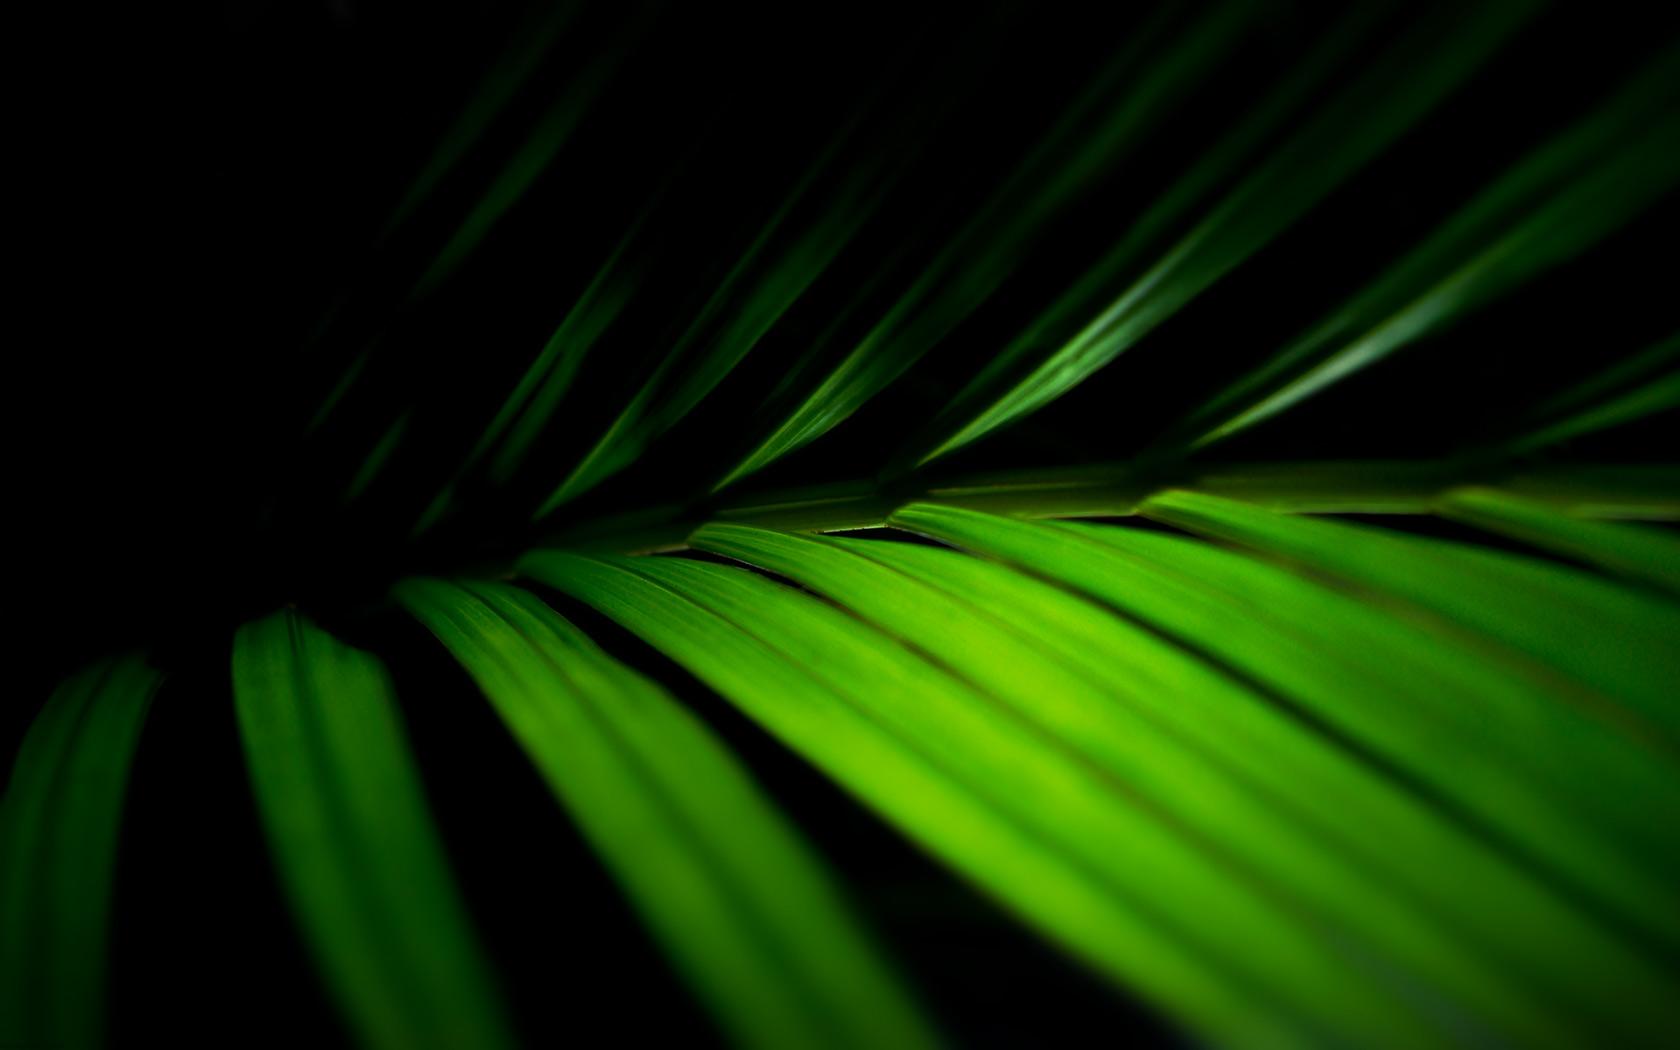 Palm Fronds Vista Desktop Background 1680x1050 pixel Popular HD 1680x1050